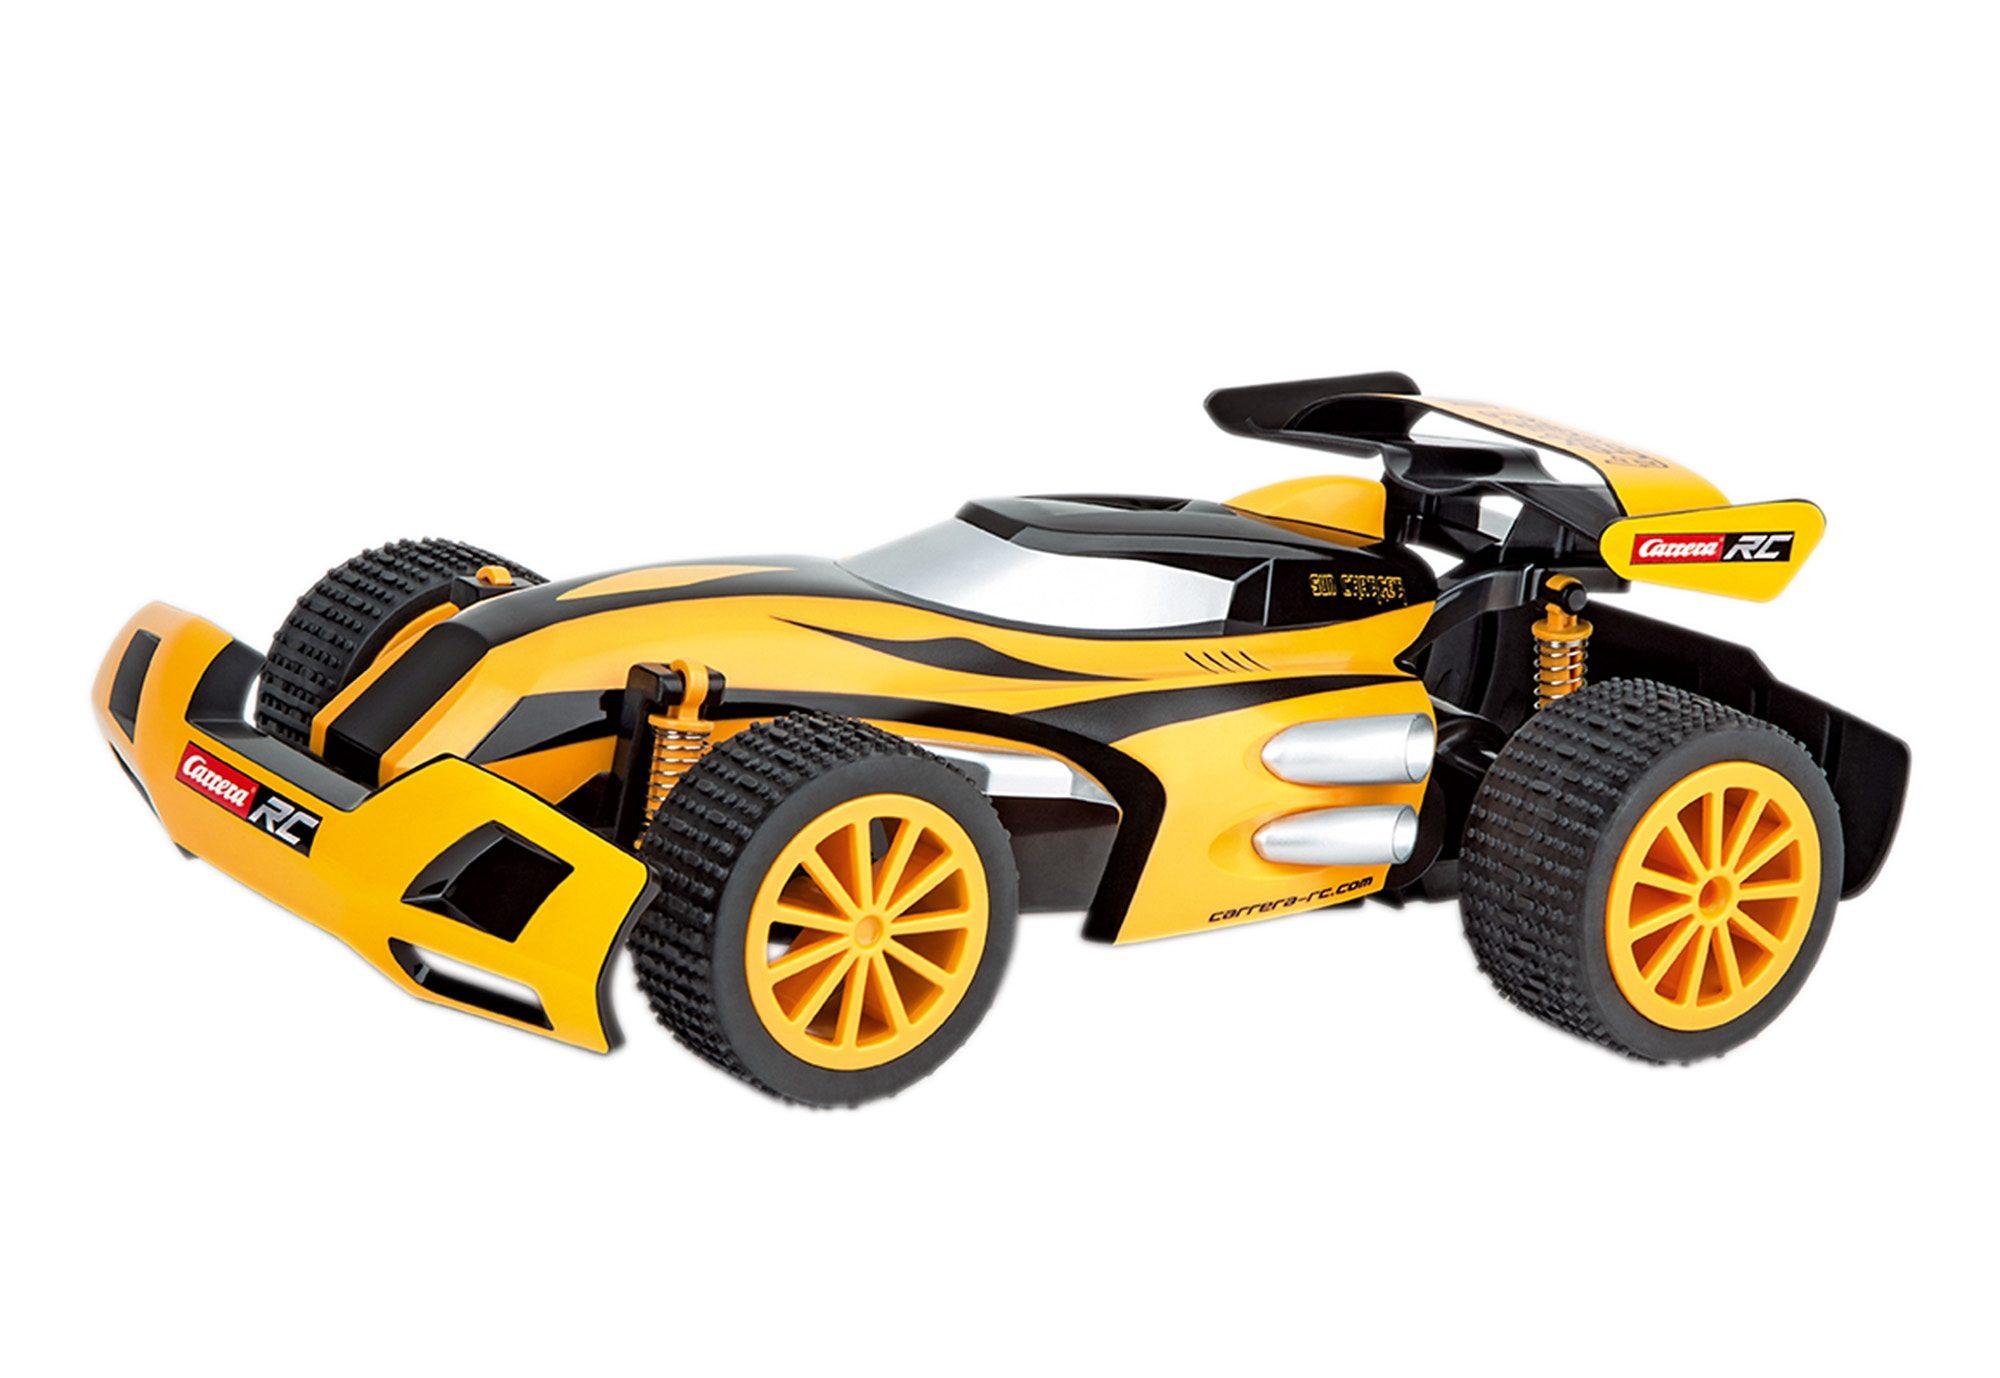 Carrera® RC-Komplett-Set »Carrera®RC - Sun Charger«